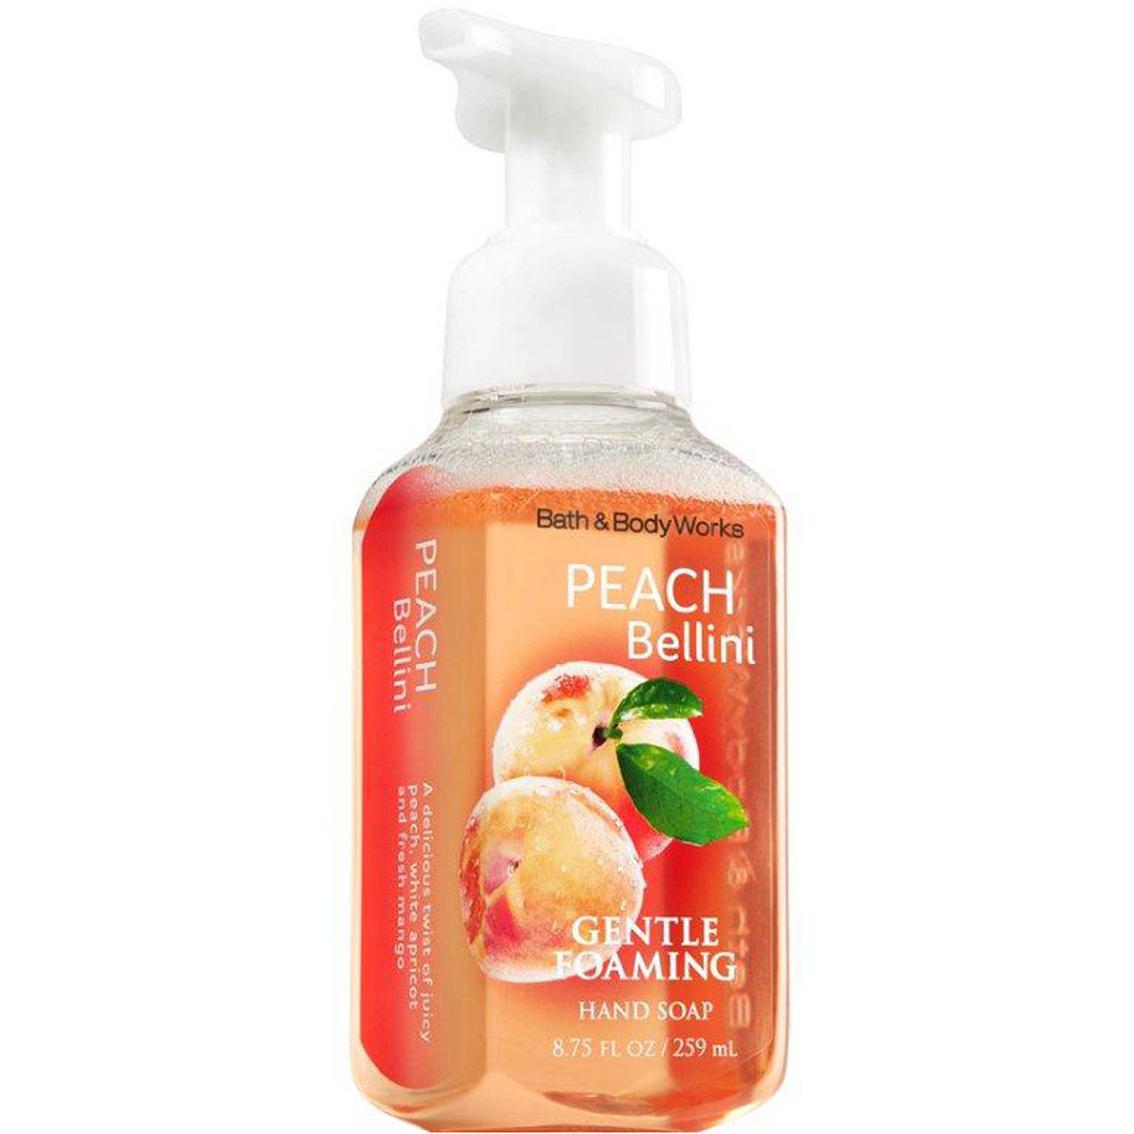 Bath Body Works Peach Bellini Gentle Foaming Hand Soap Signature